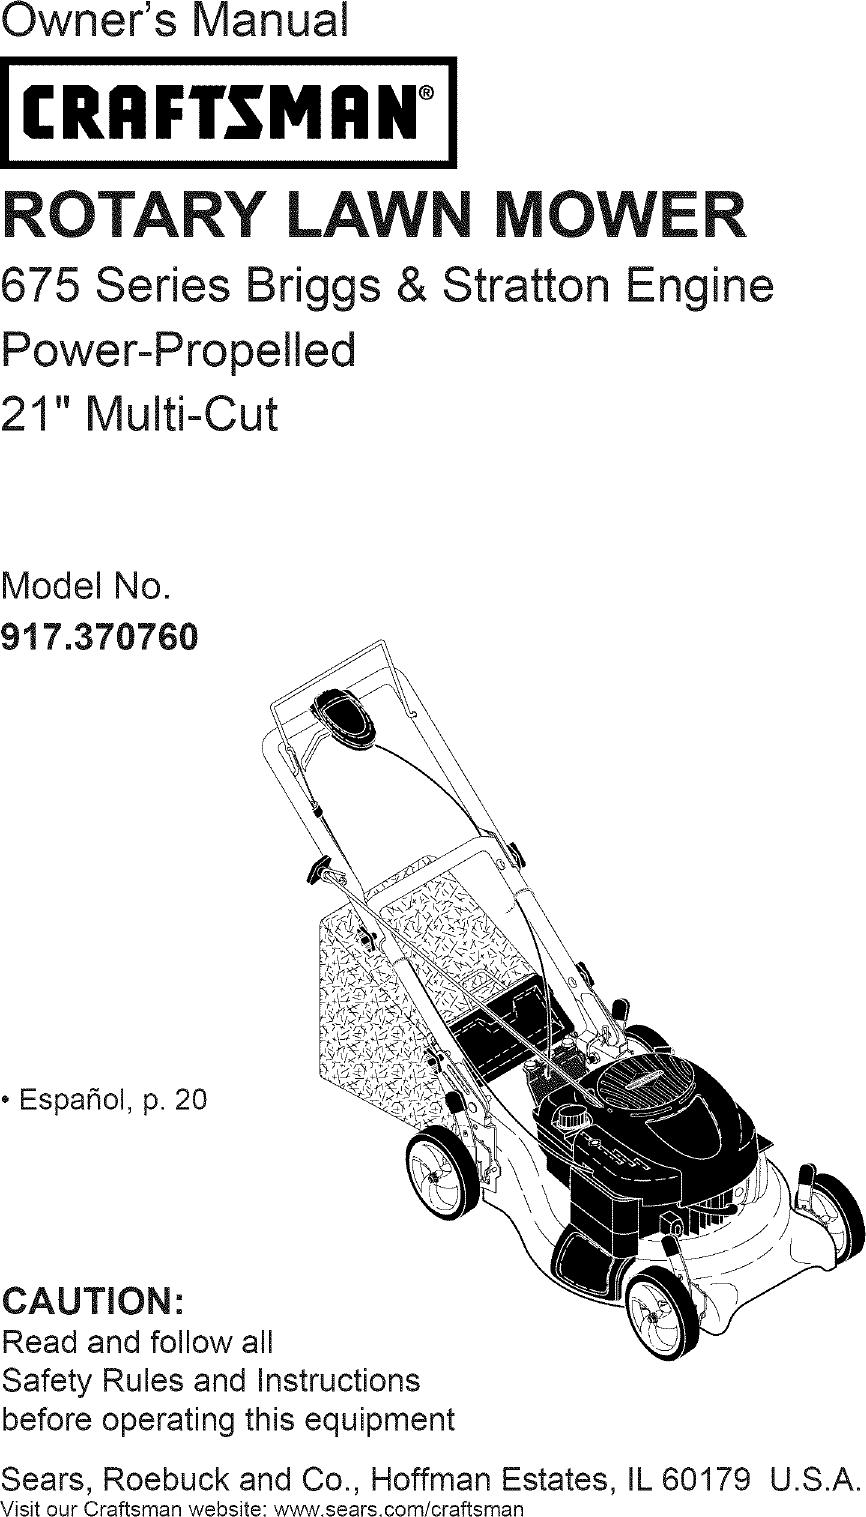 Craftsman 917370760 User Manual LAWN MOWER Manuals And